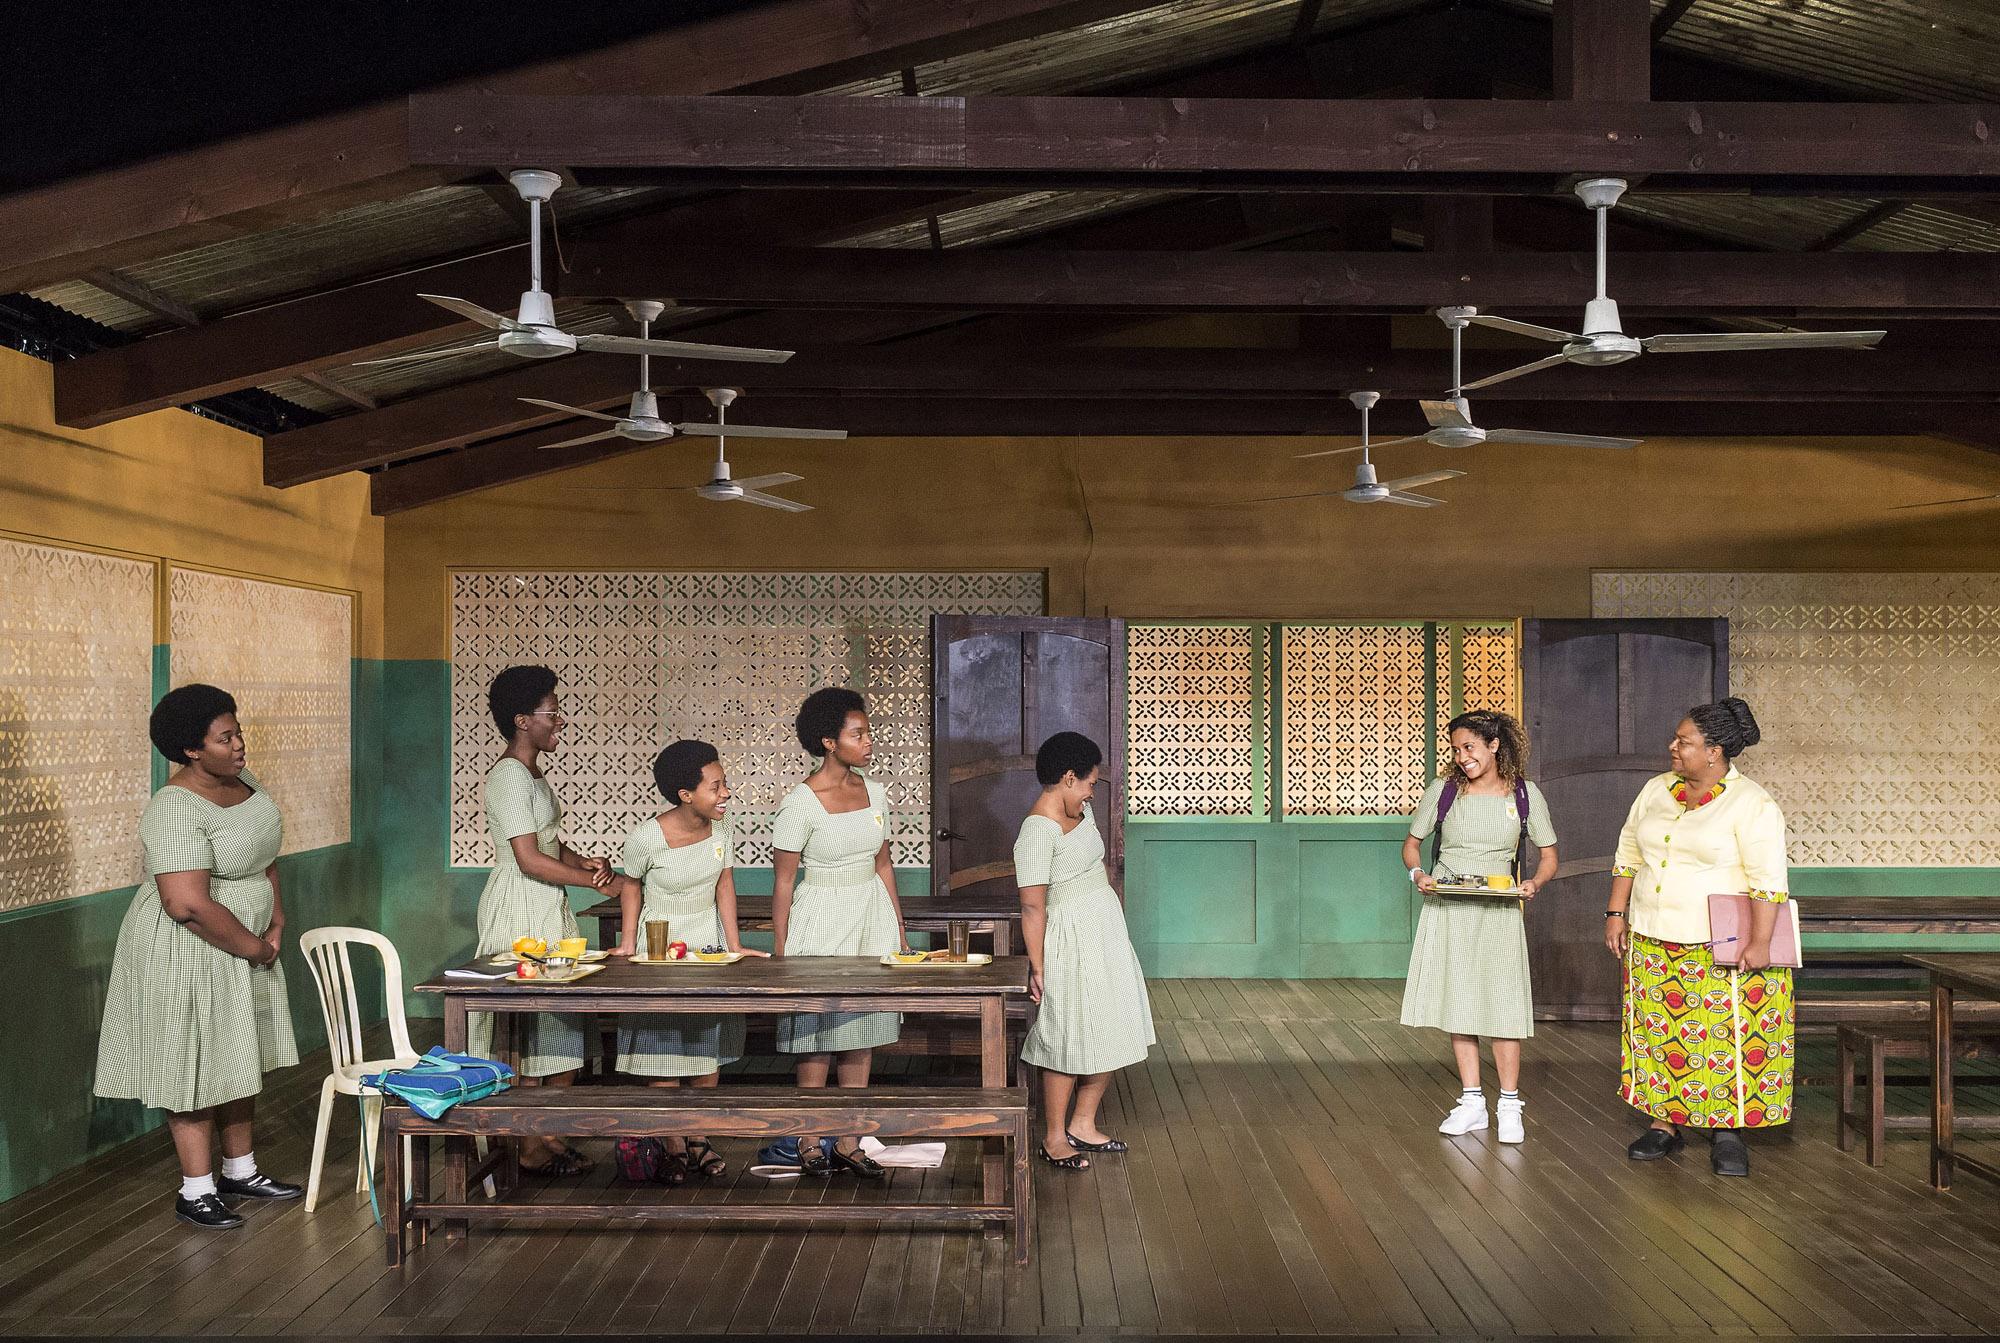 WEB-054.L-R-Abena-Mensah-Bonsu-Latoya-Edwards-Mirirai-Sithole-MaameYaa-Boafo-Paige-Gilbert-Joanna-A.-Jones-and-Myra-Lucretia-Taylor-in-School-Girls-Or-the-African-Mean-Girls-Play-photo-by-Craig-Schwartz.jpg